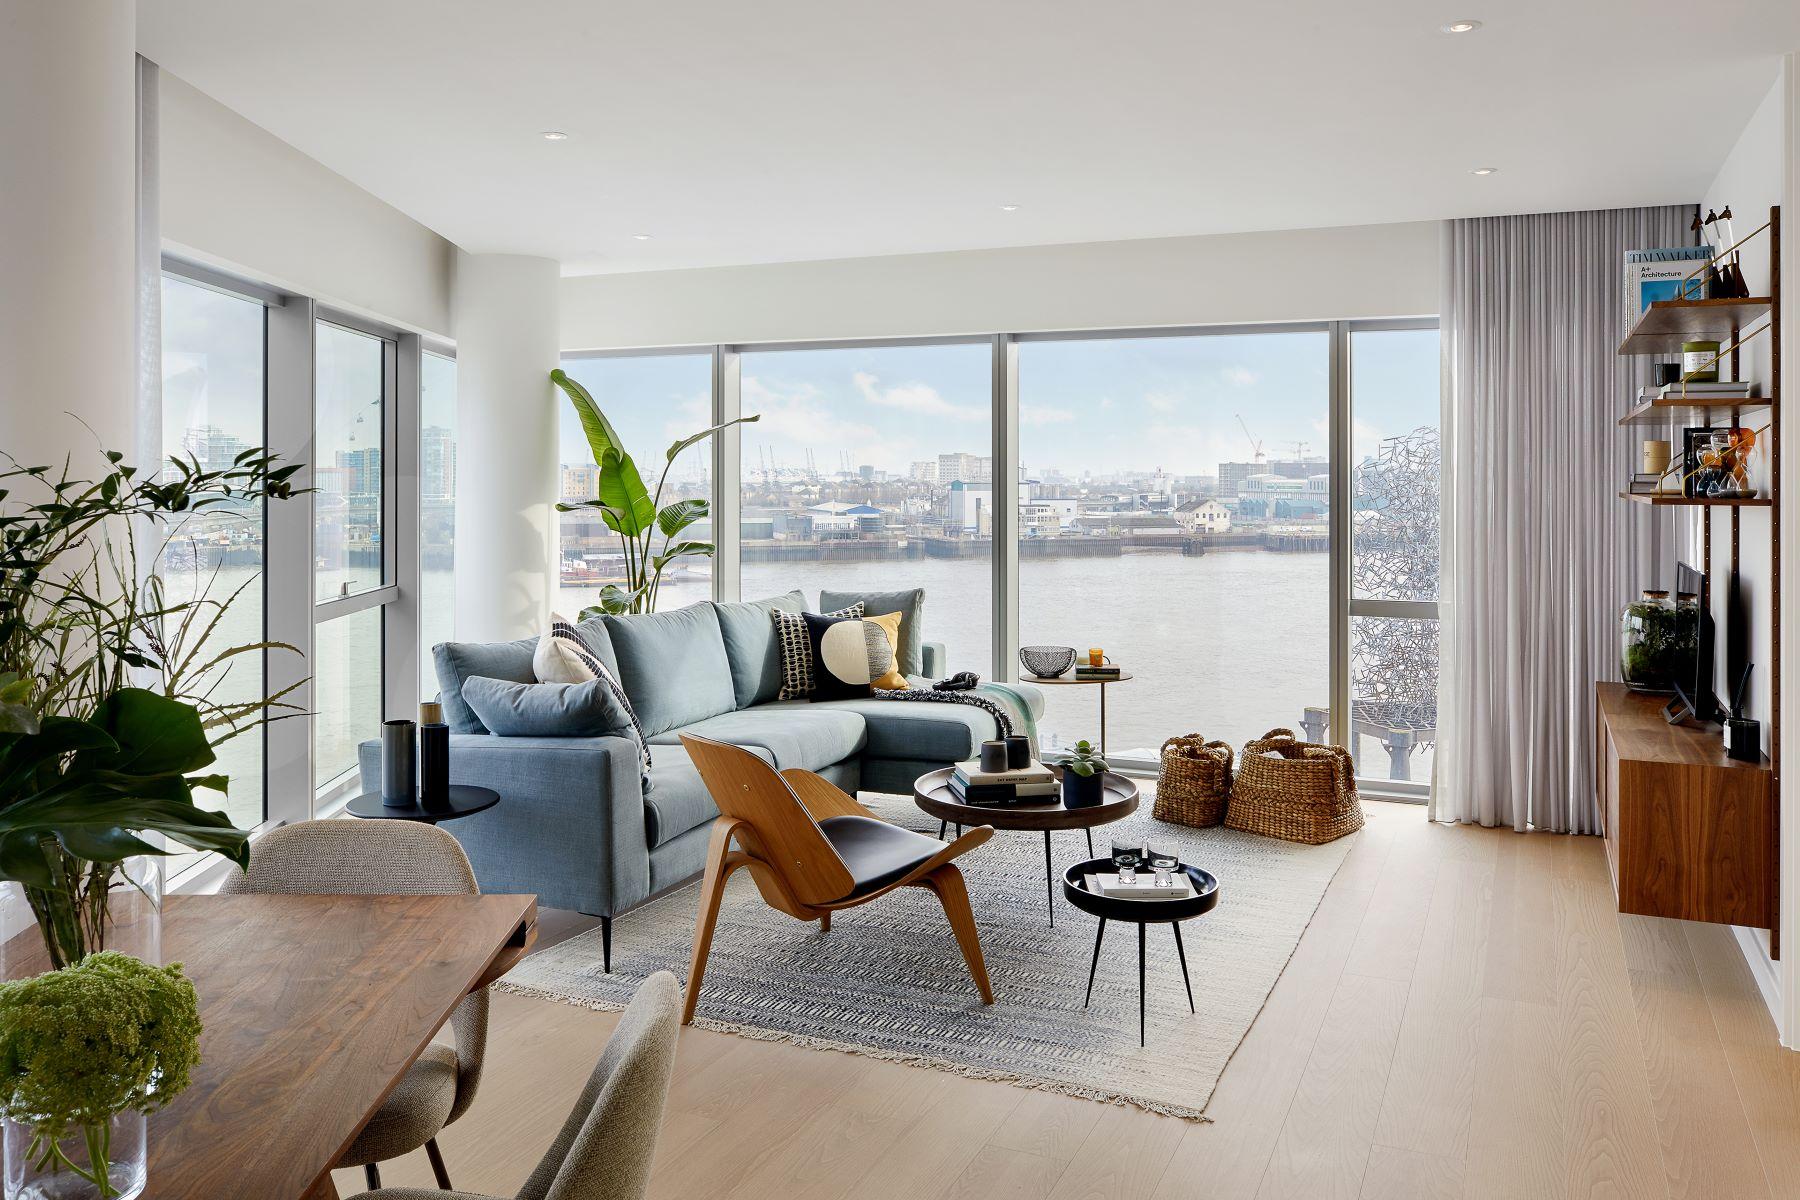 Apartments for Sale at Greenwich Peninsula Building 1 (02.06), Upper Riverside London, England SE10 0SQ United Kingdom